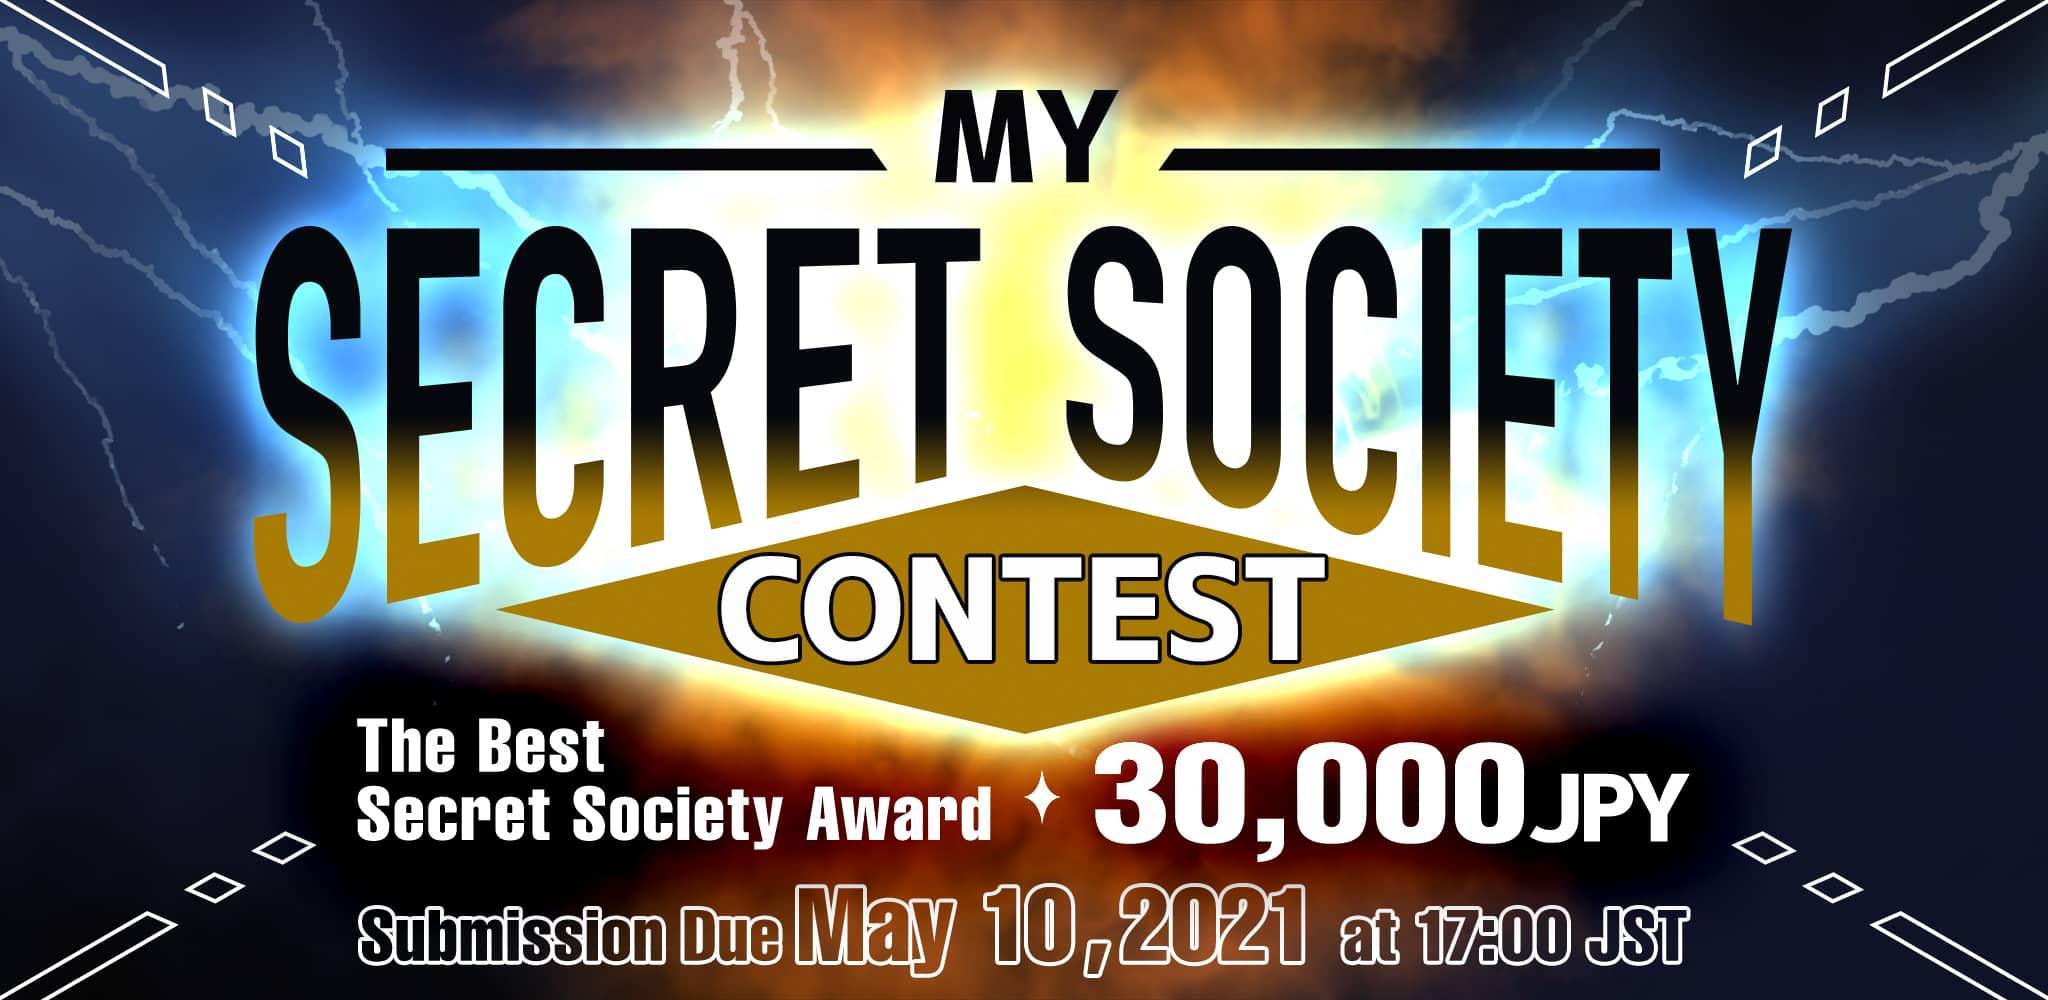 My Secret Society Contest